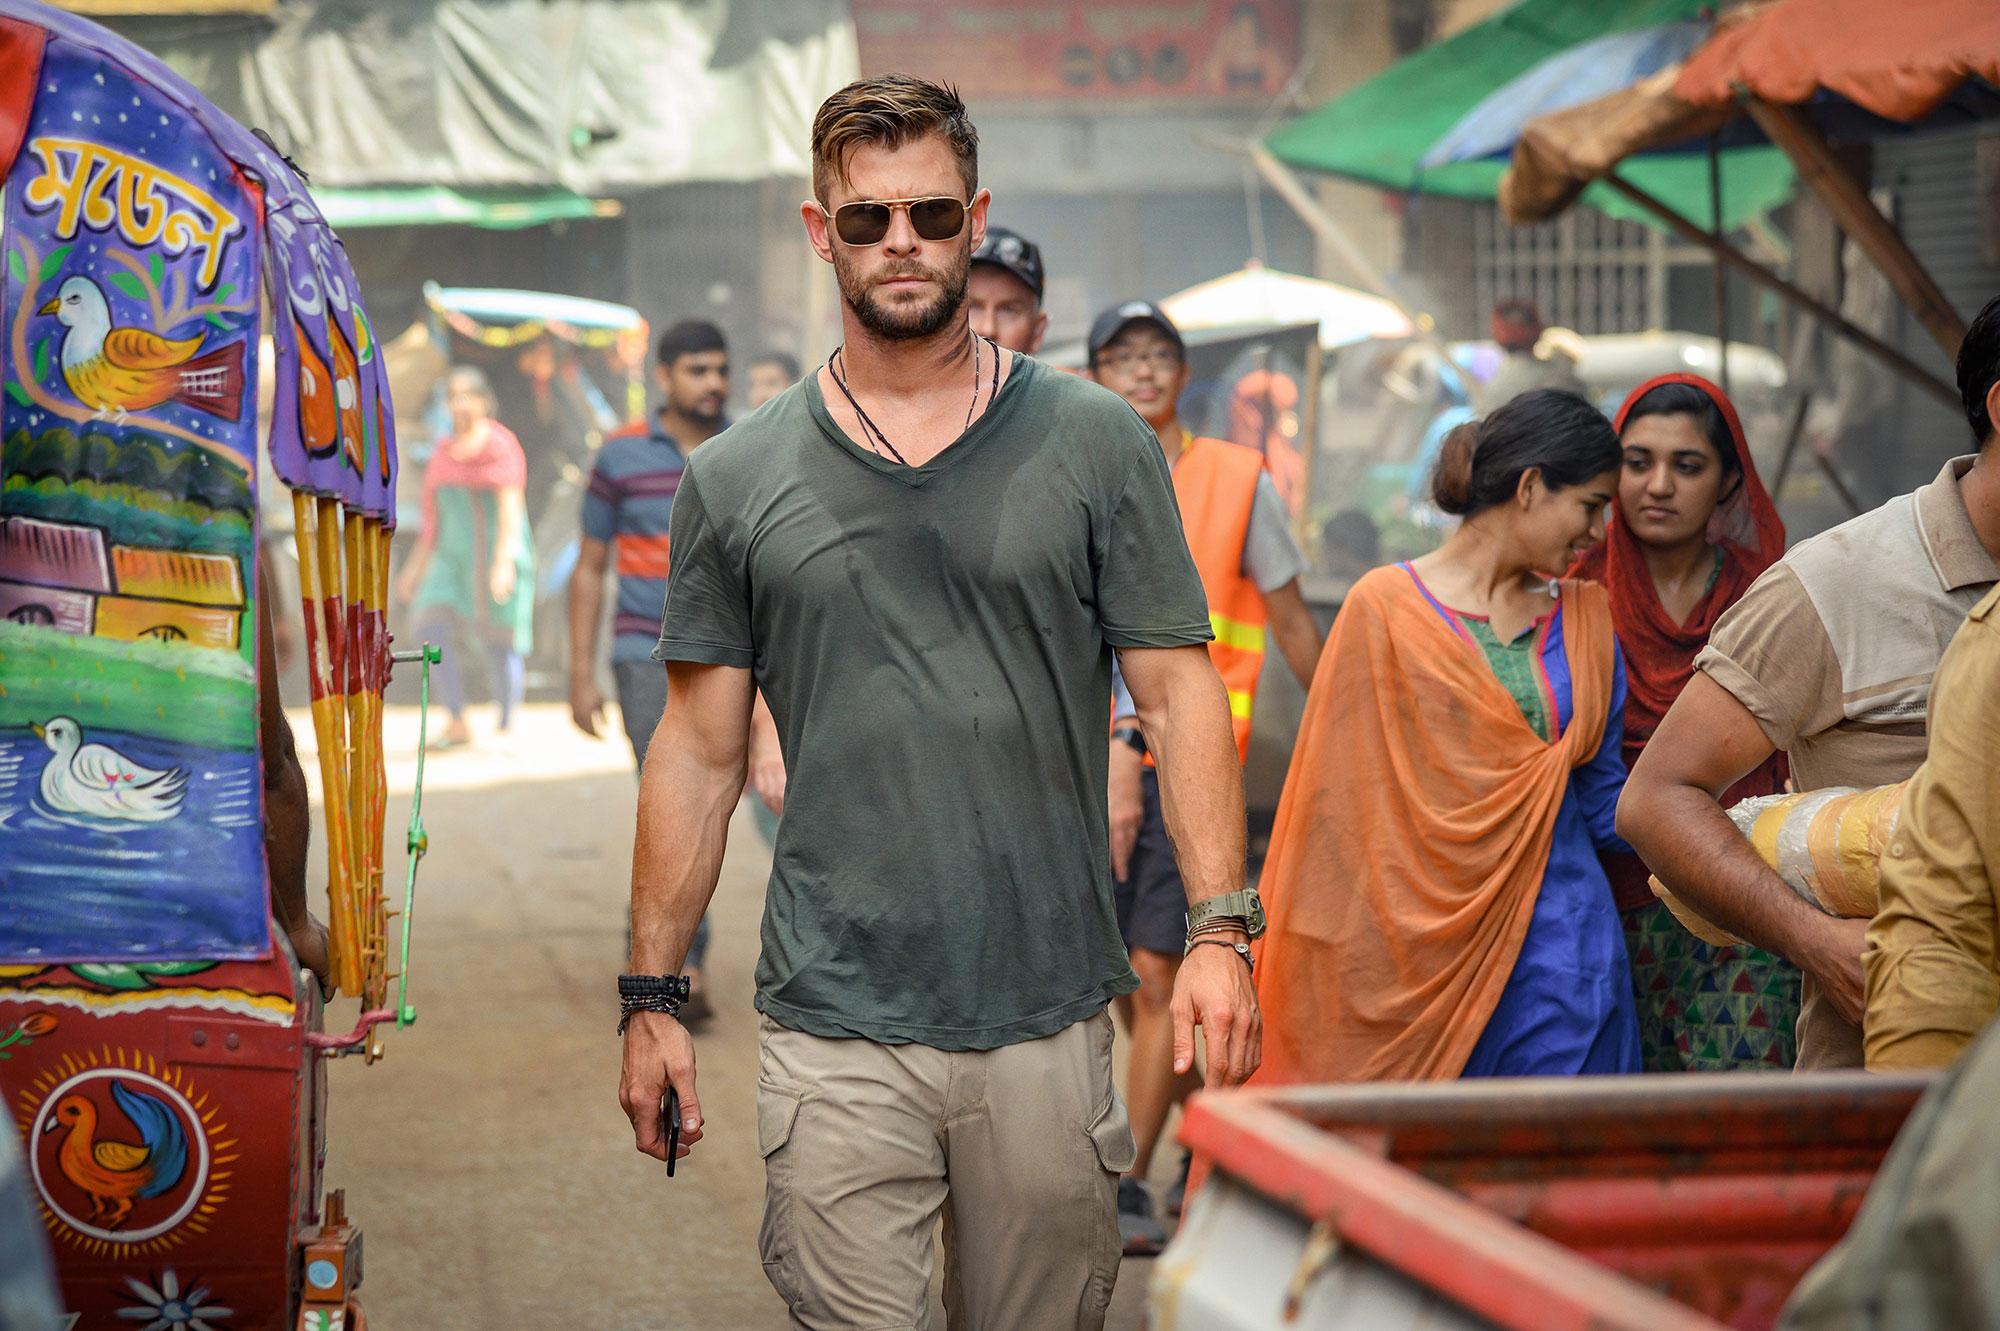 Extraction Chris Hemsworth Bild 1